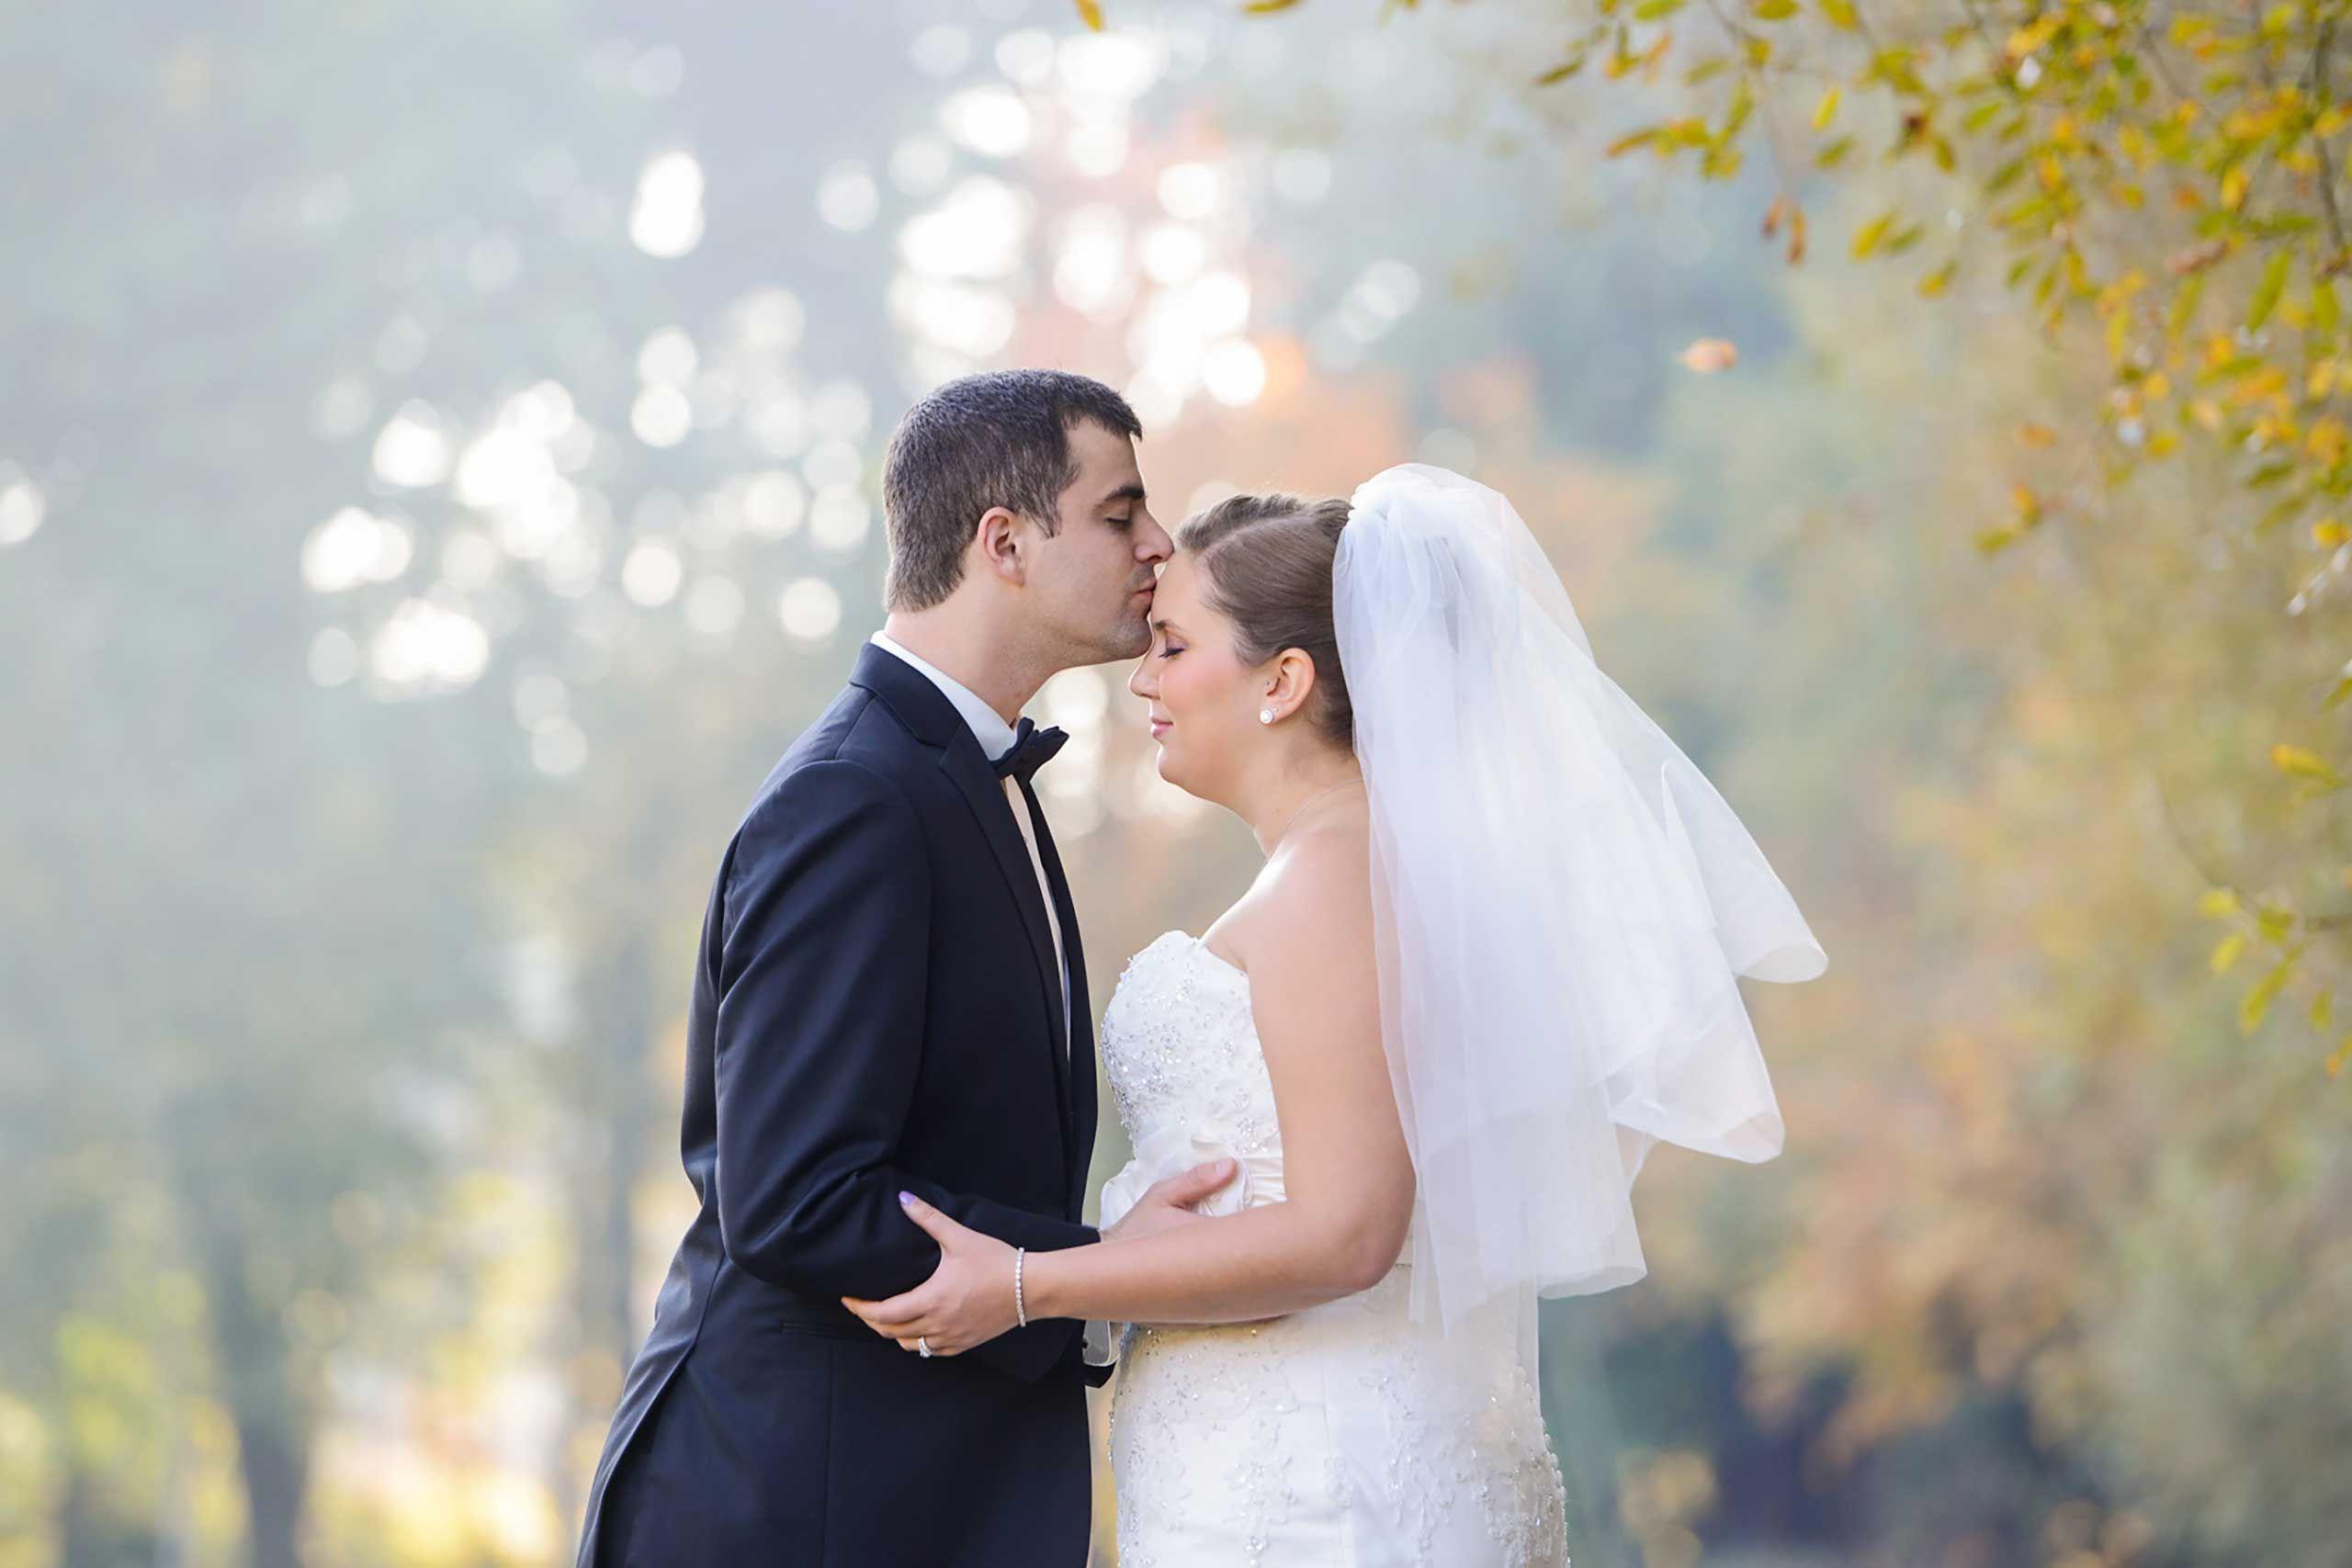 Autumn wedding in Oregon